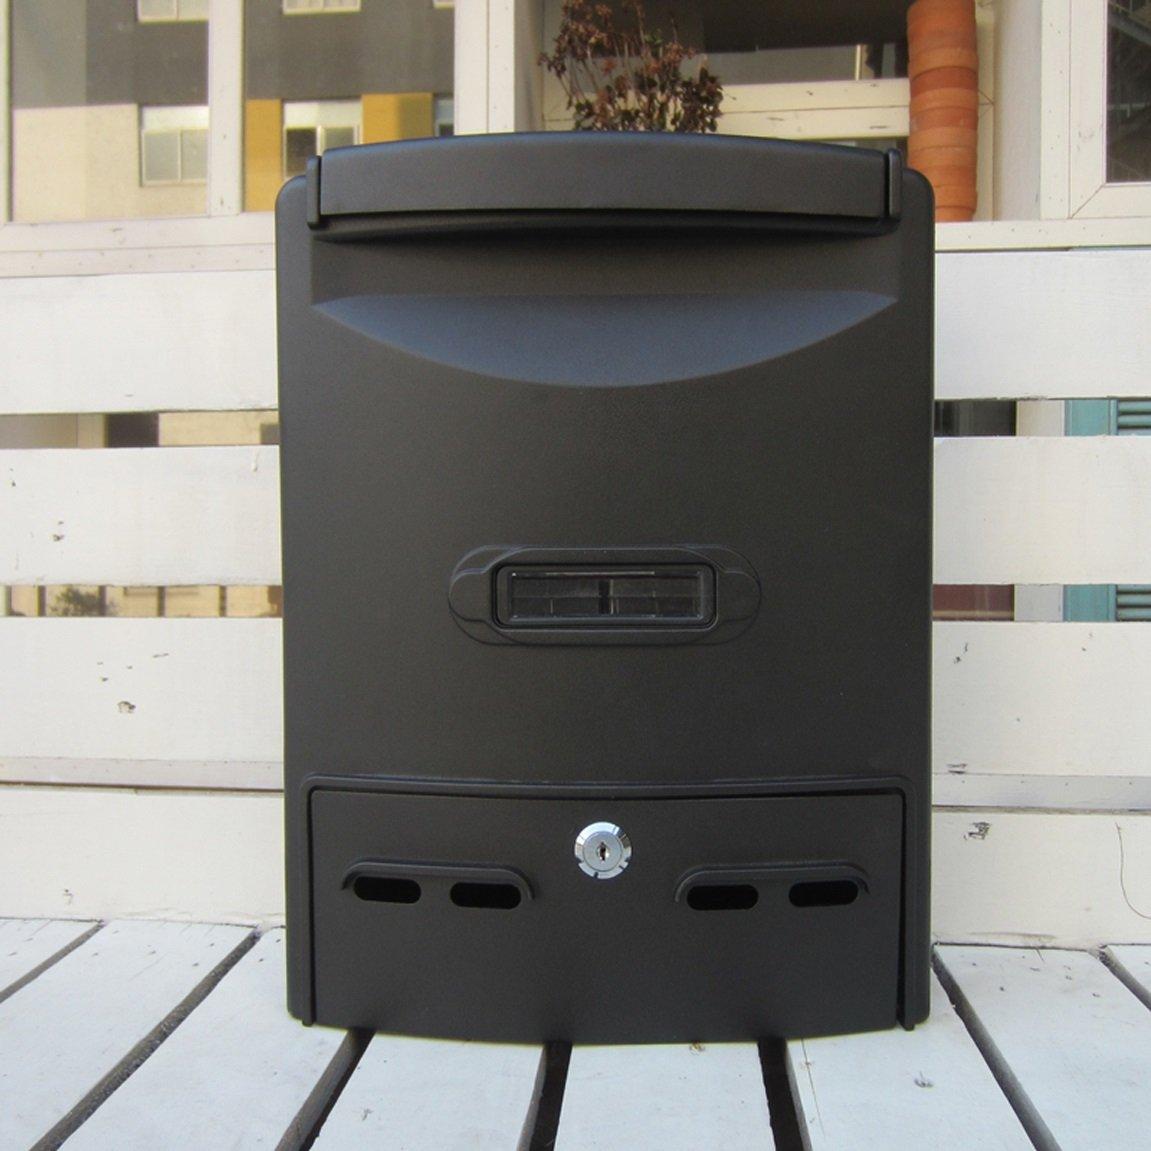 TLMY ヨーロッパの郵便箱防水と防水屋外のメールボックスゼネラルマネージャーの提案箱の壁の回収ボックス メールボックス   B07JCMT11N